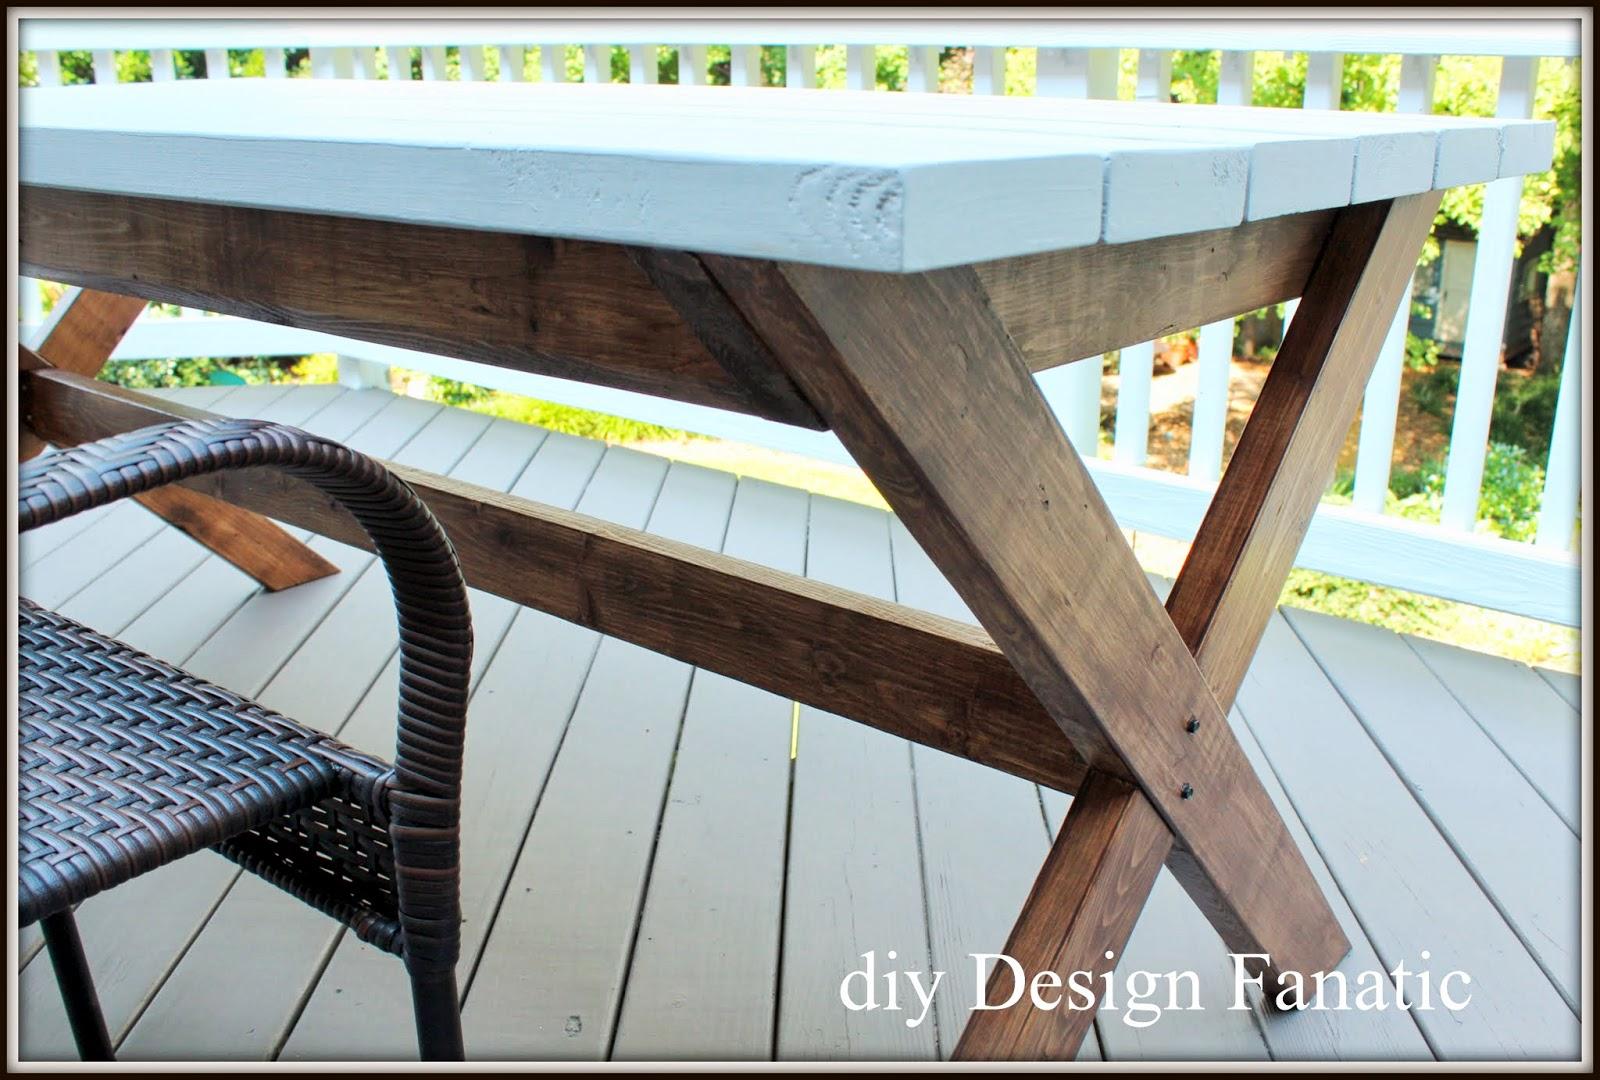 Inspirational diy picnic table Kreg jig Behr deck stain